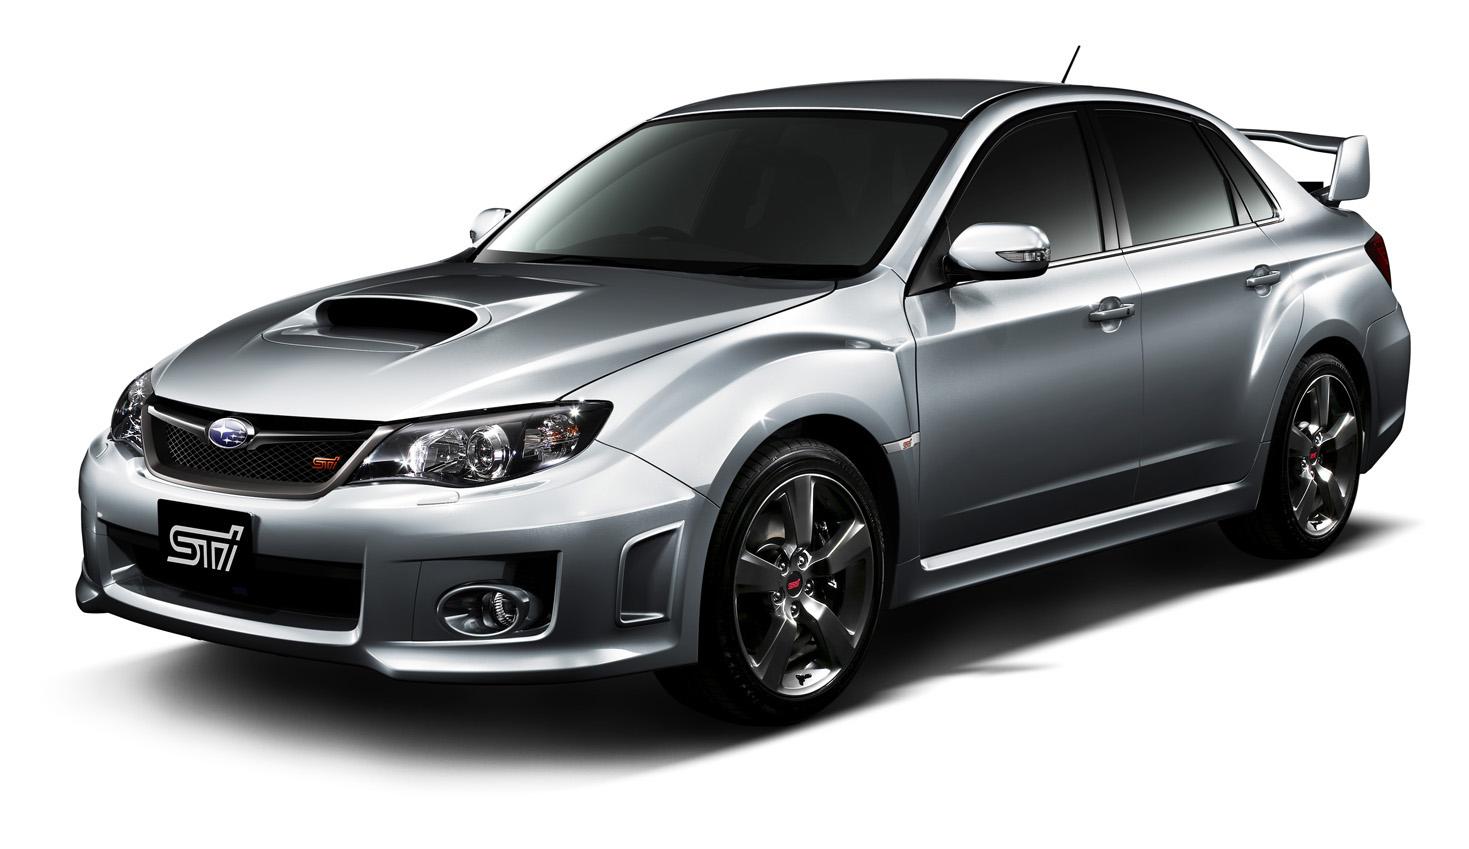 2011 Subaru Impreza Wrx Sti Automatic Photos Caradvice